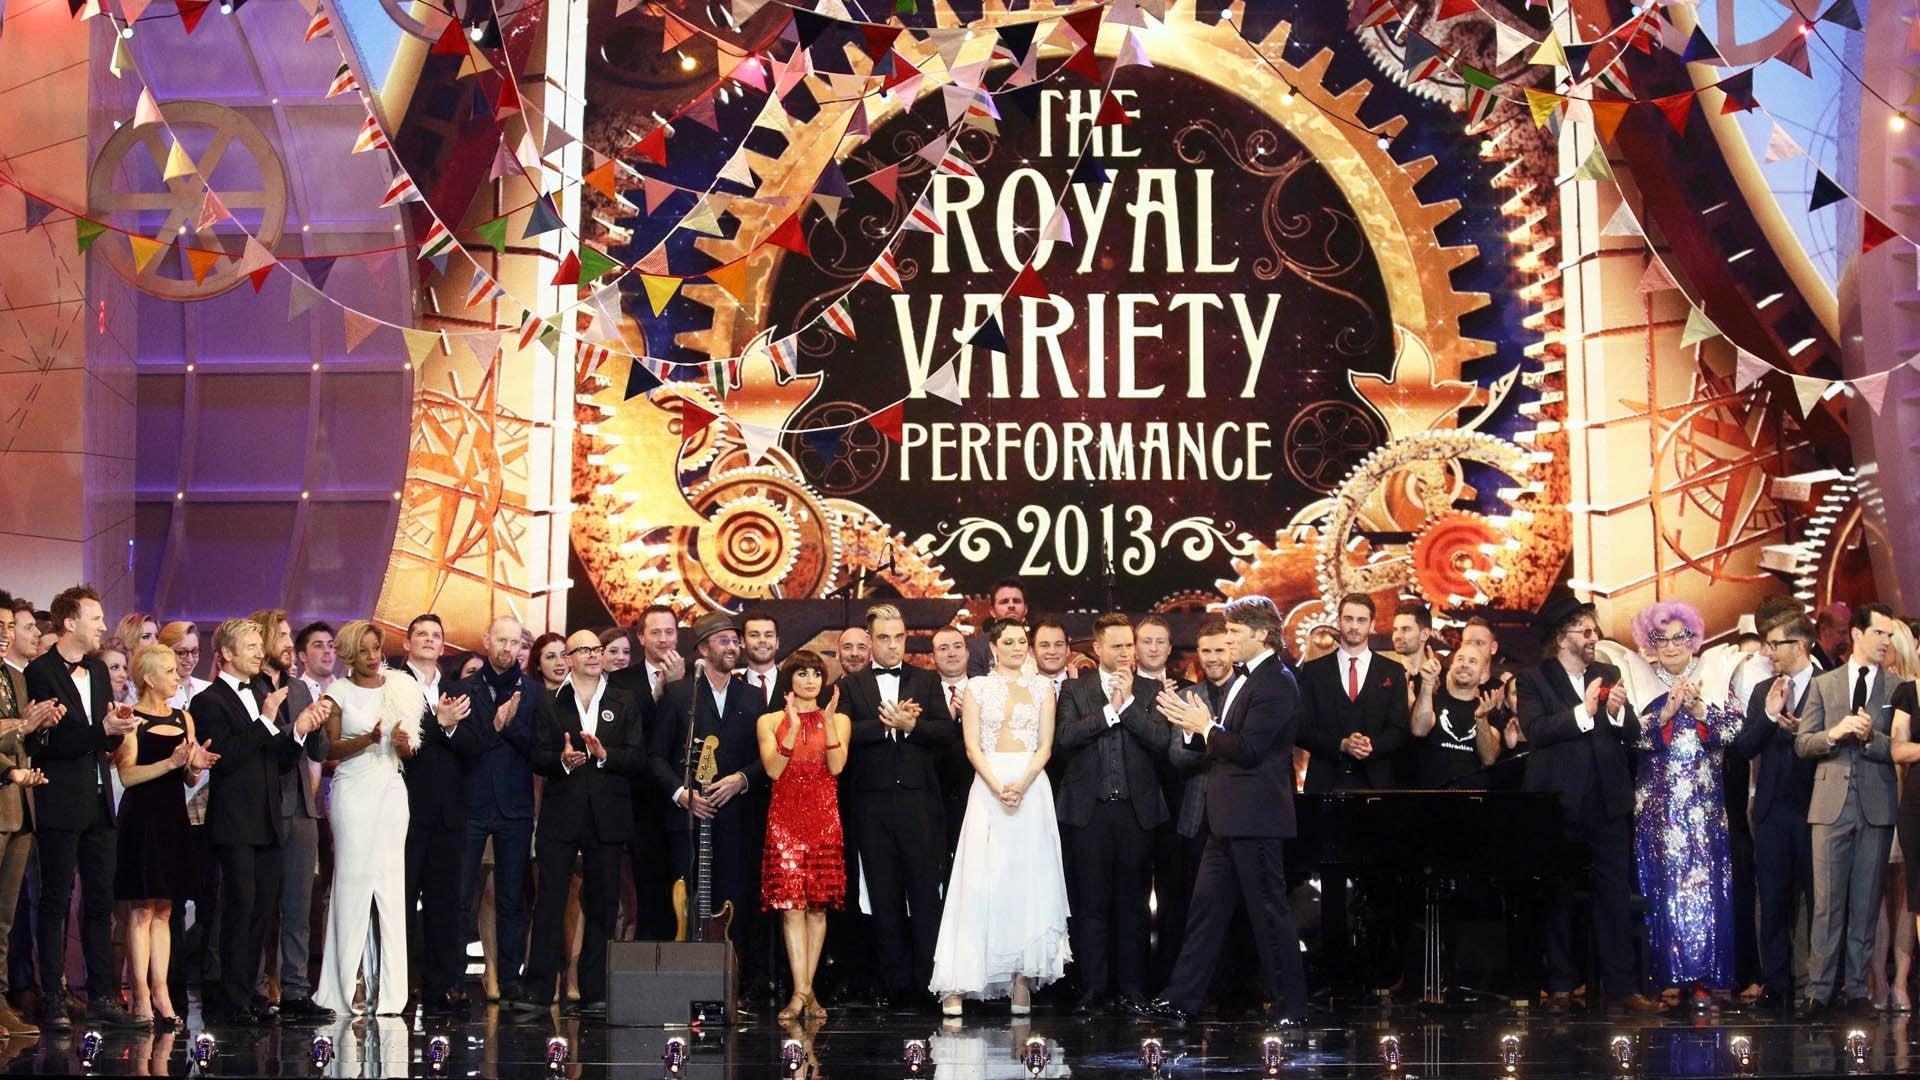 The Royal Variety Performance 2013